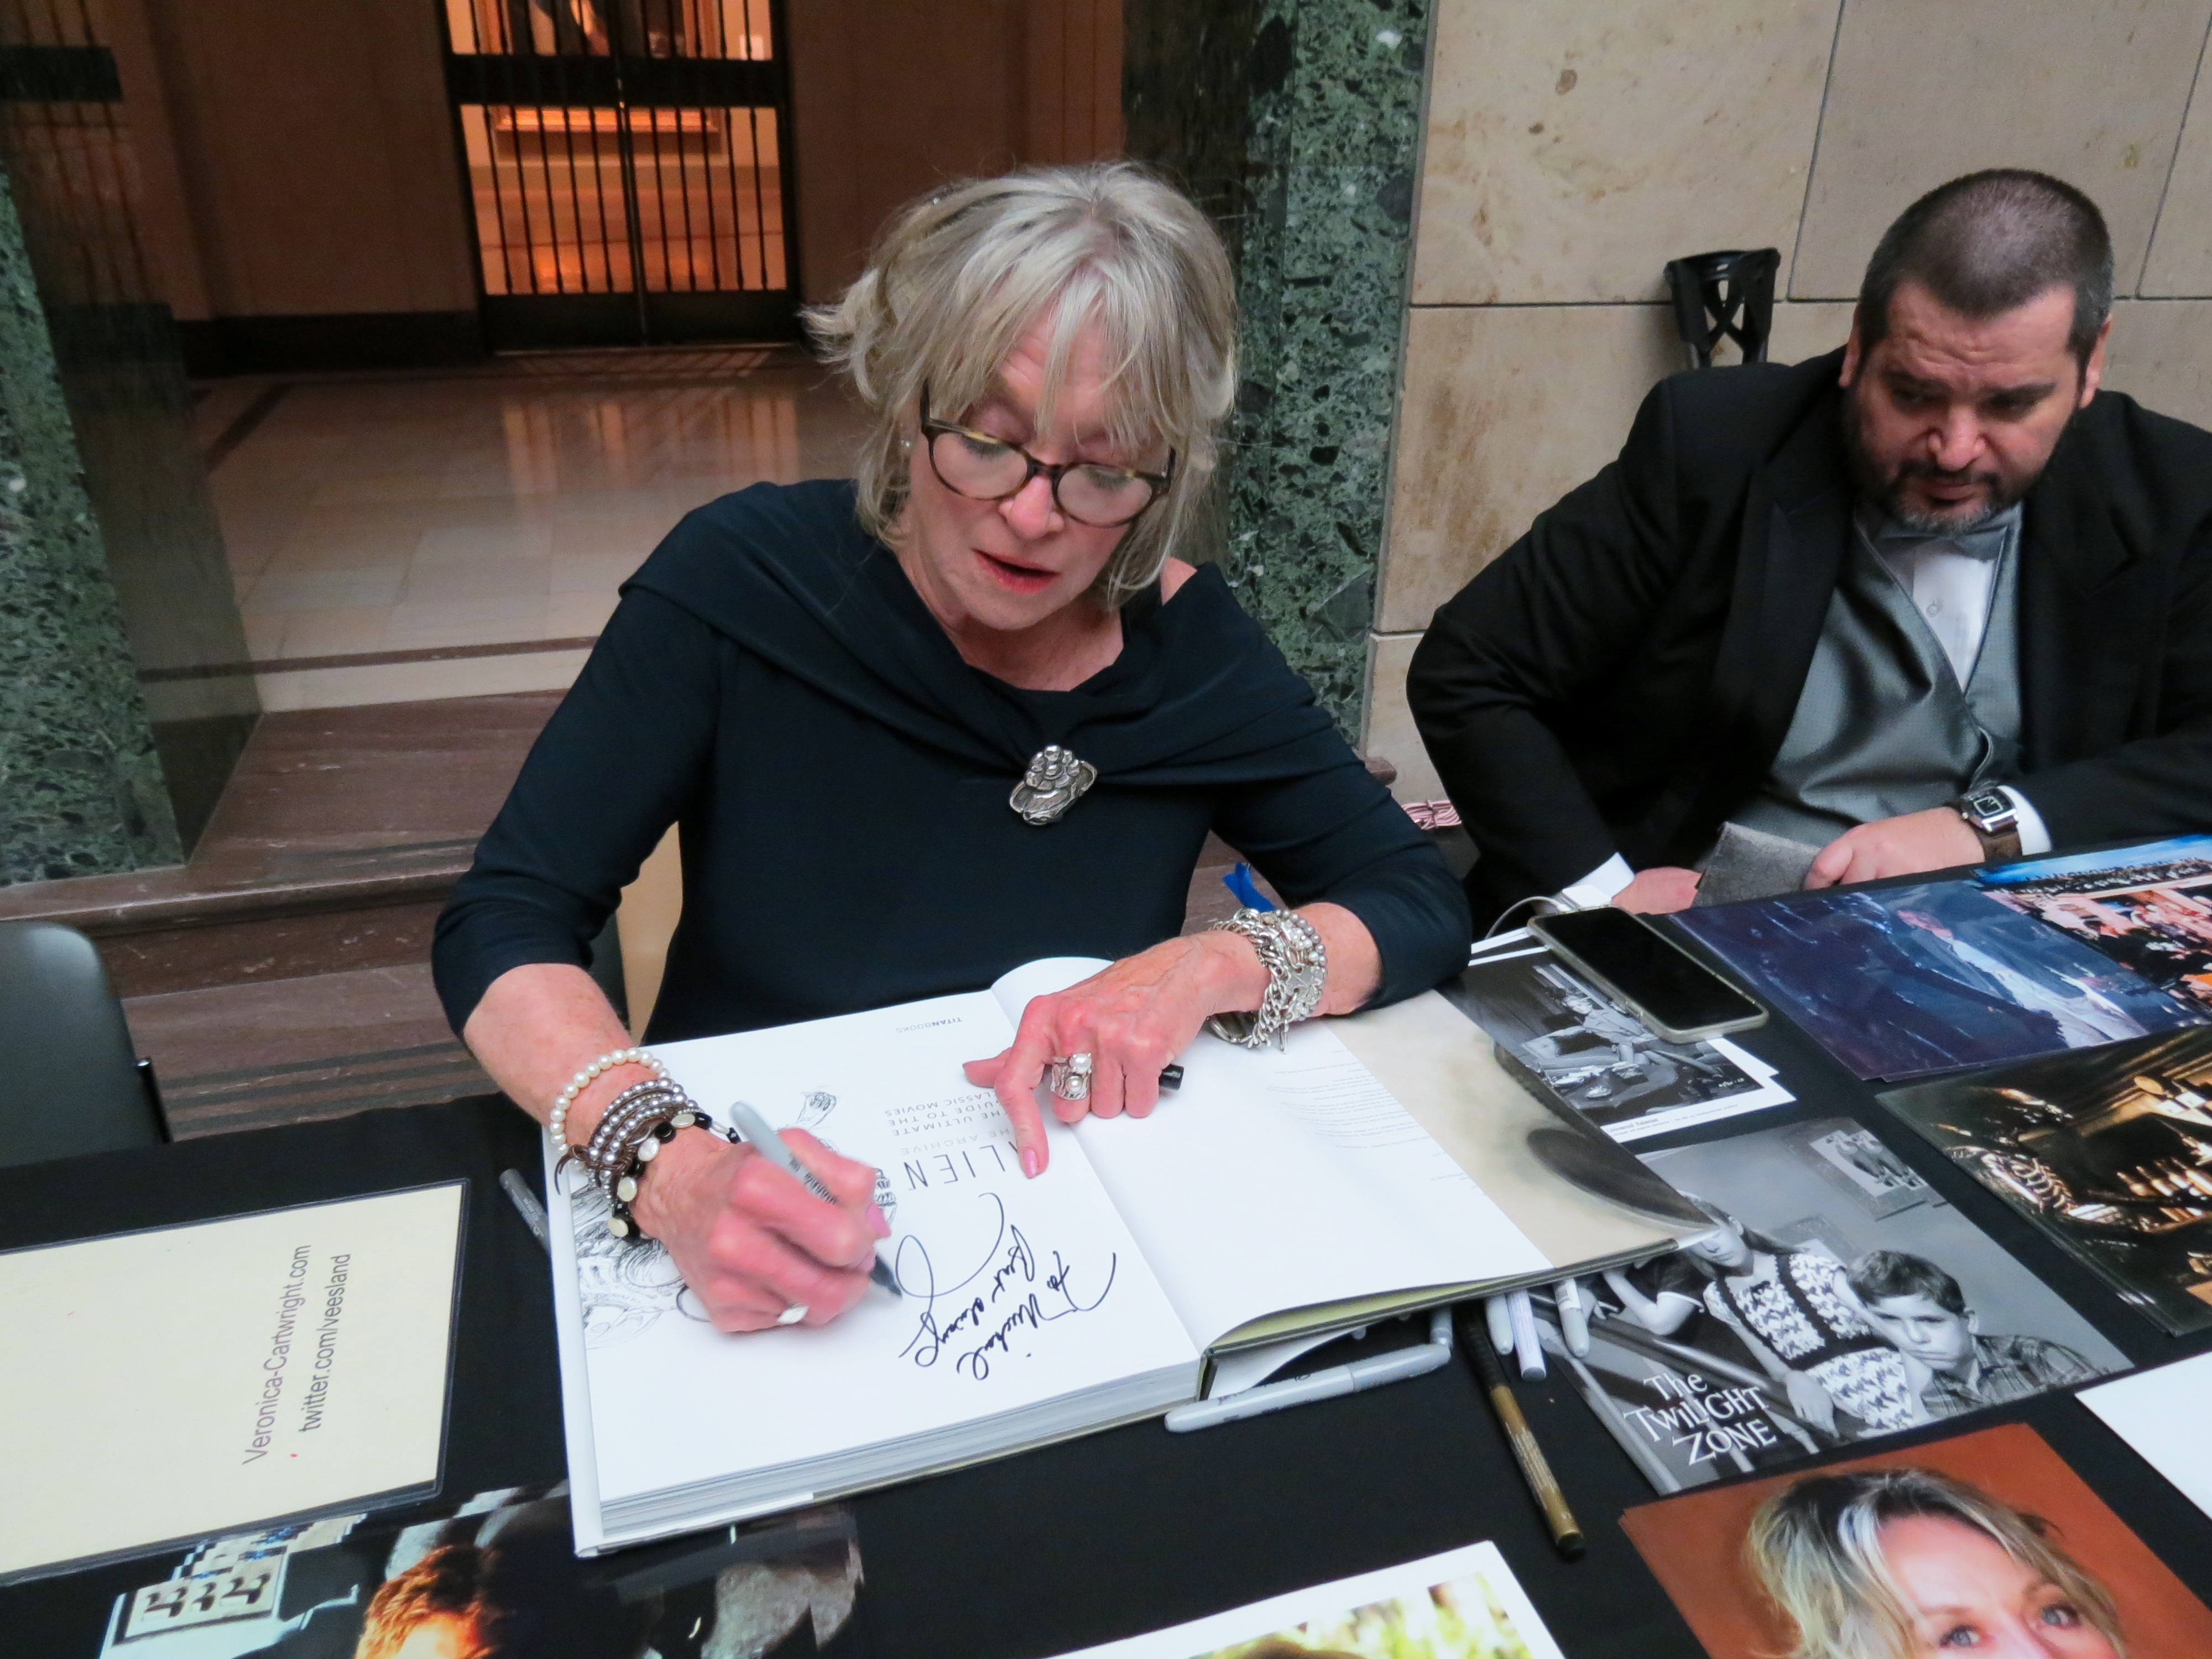 Meeting VeronicaCartwright